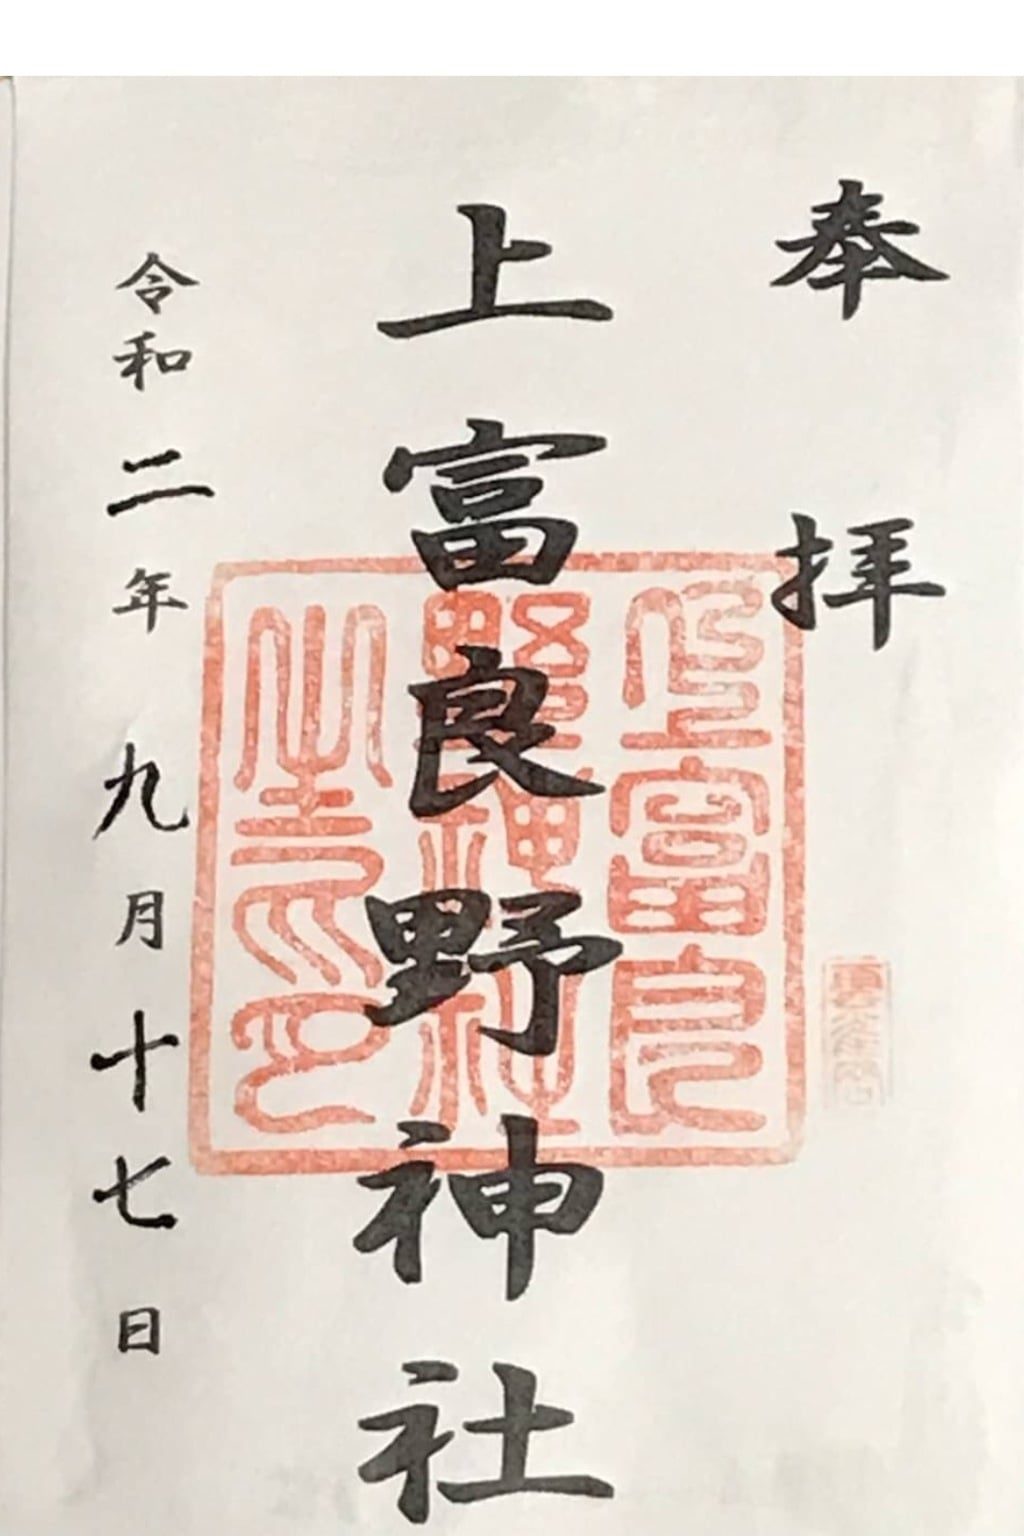 上富良野神社の御朱印